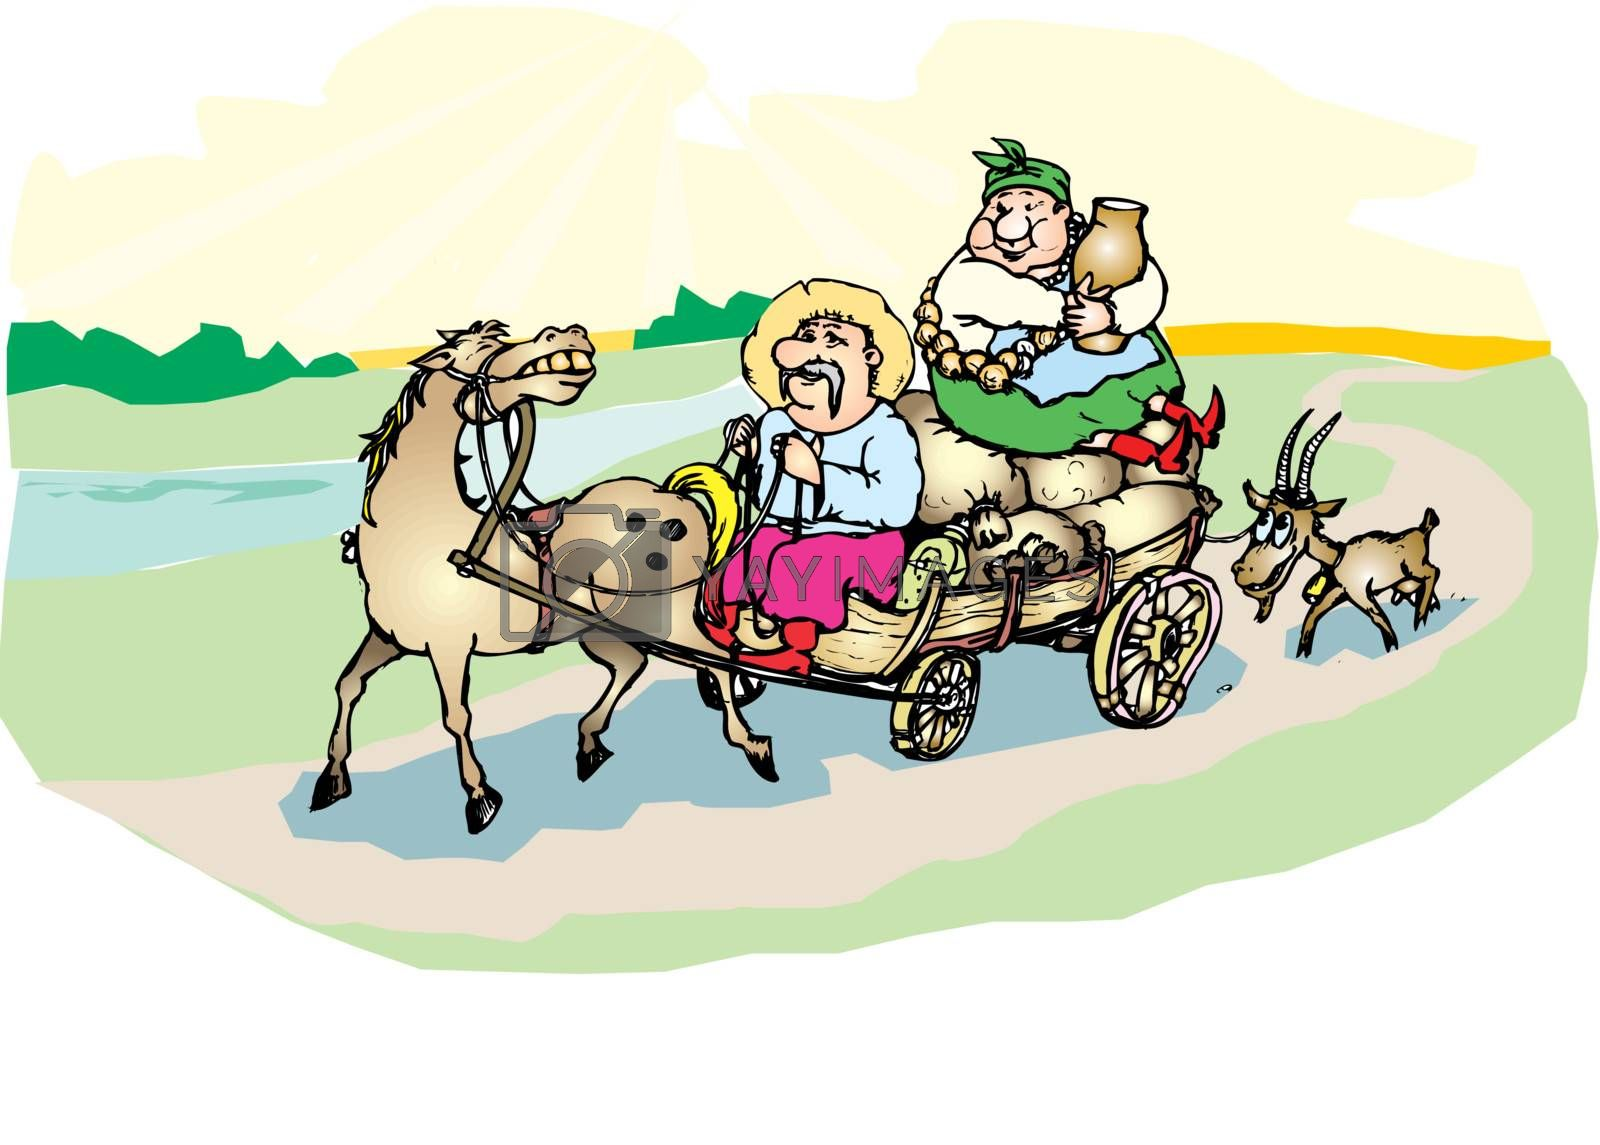 Ukrainian kozak with a wife goes by a horse